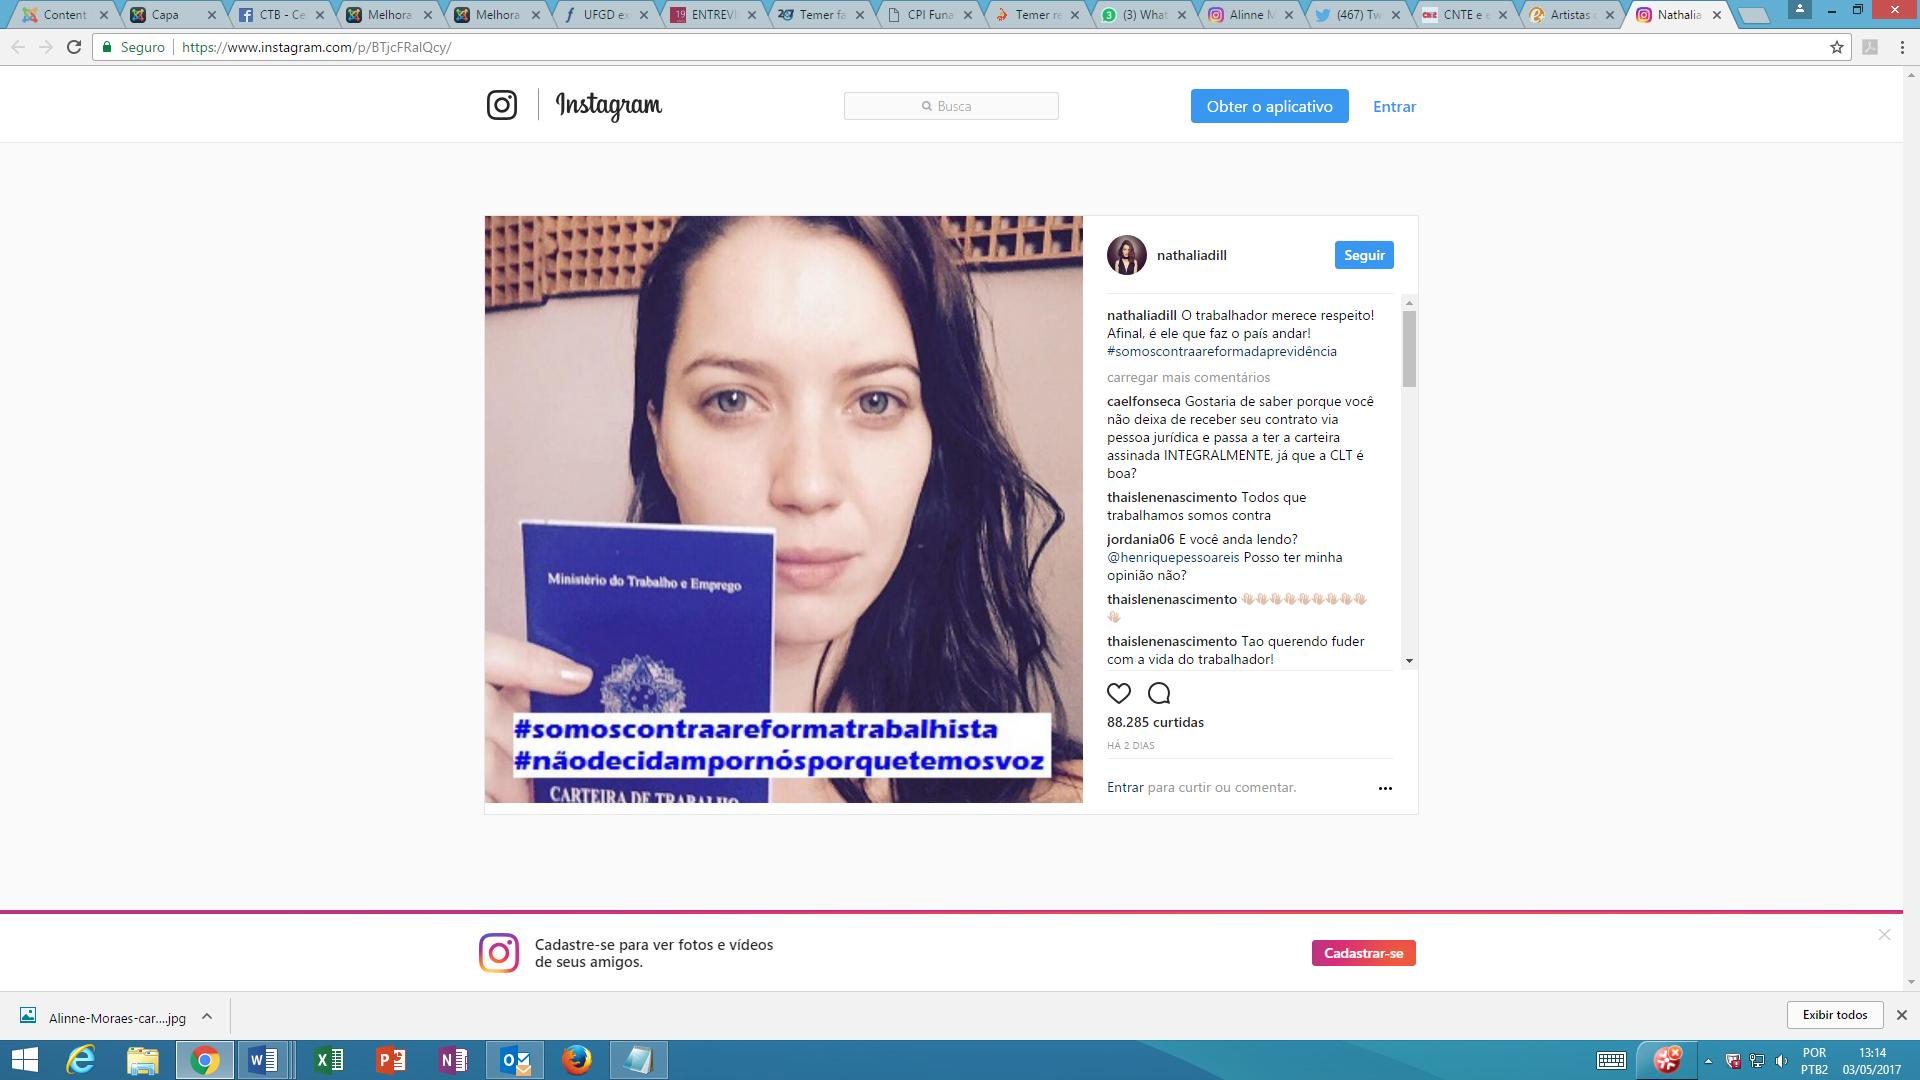 nathalia dill contra reformas instagram